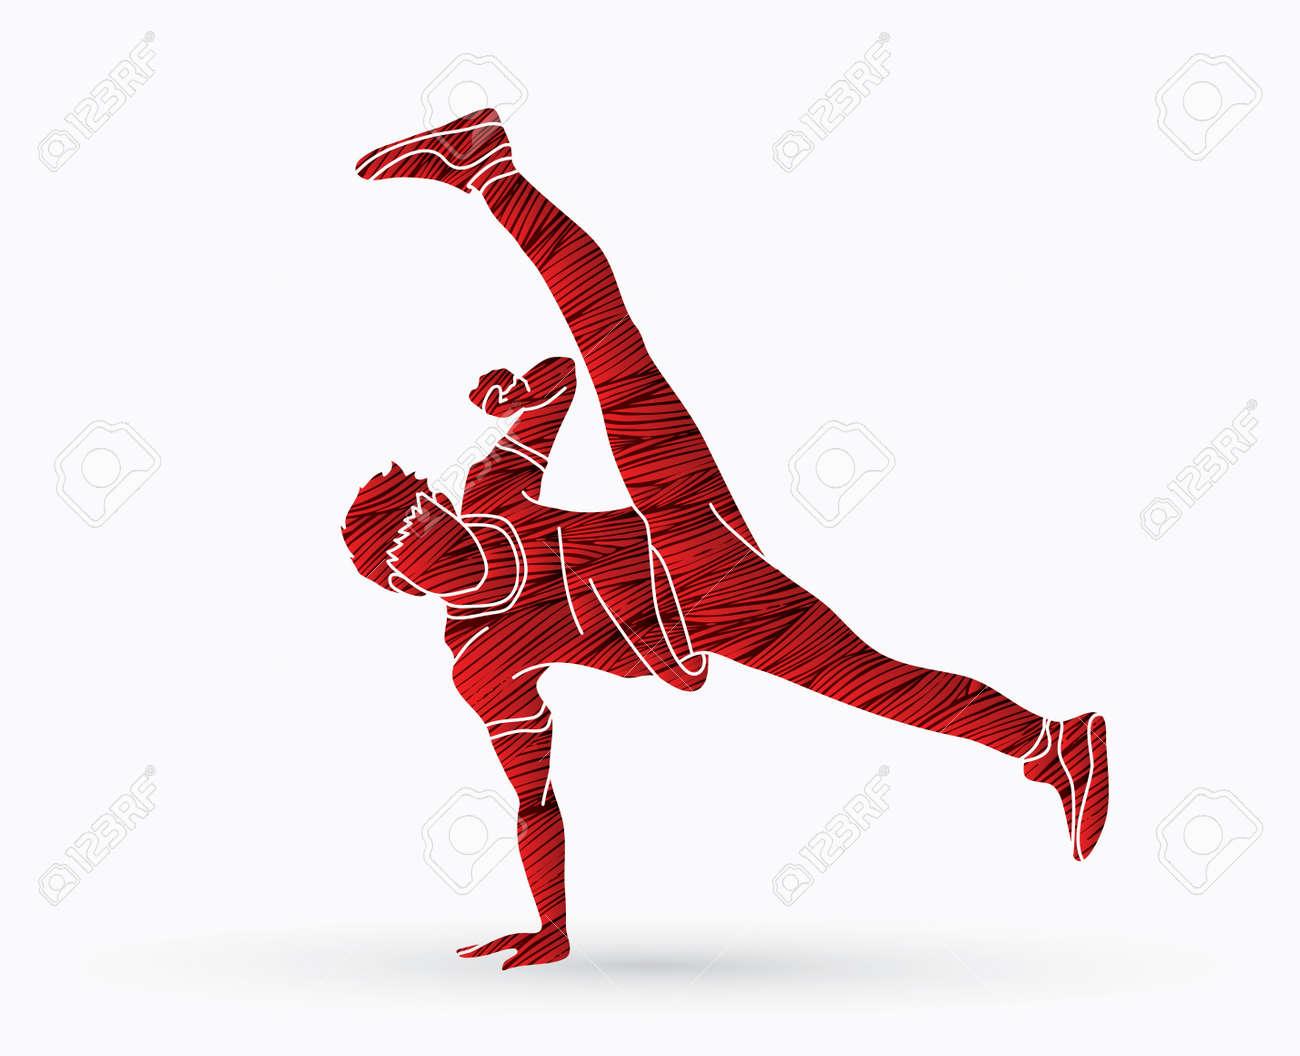 Street dance, B boys dance, hip hop dancing action designed using